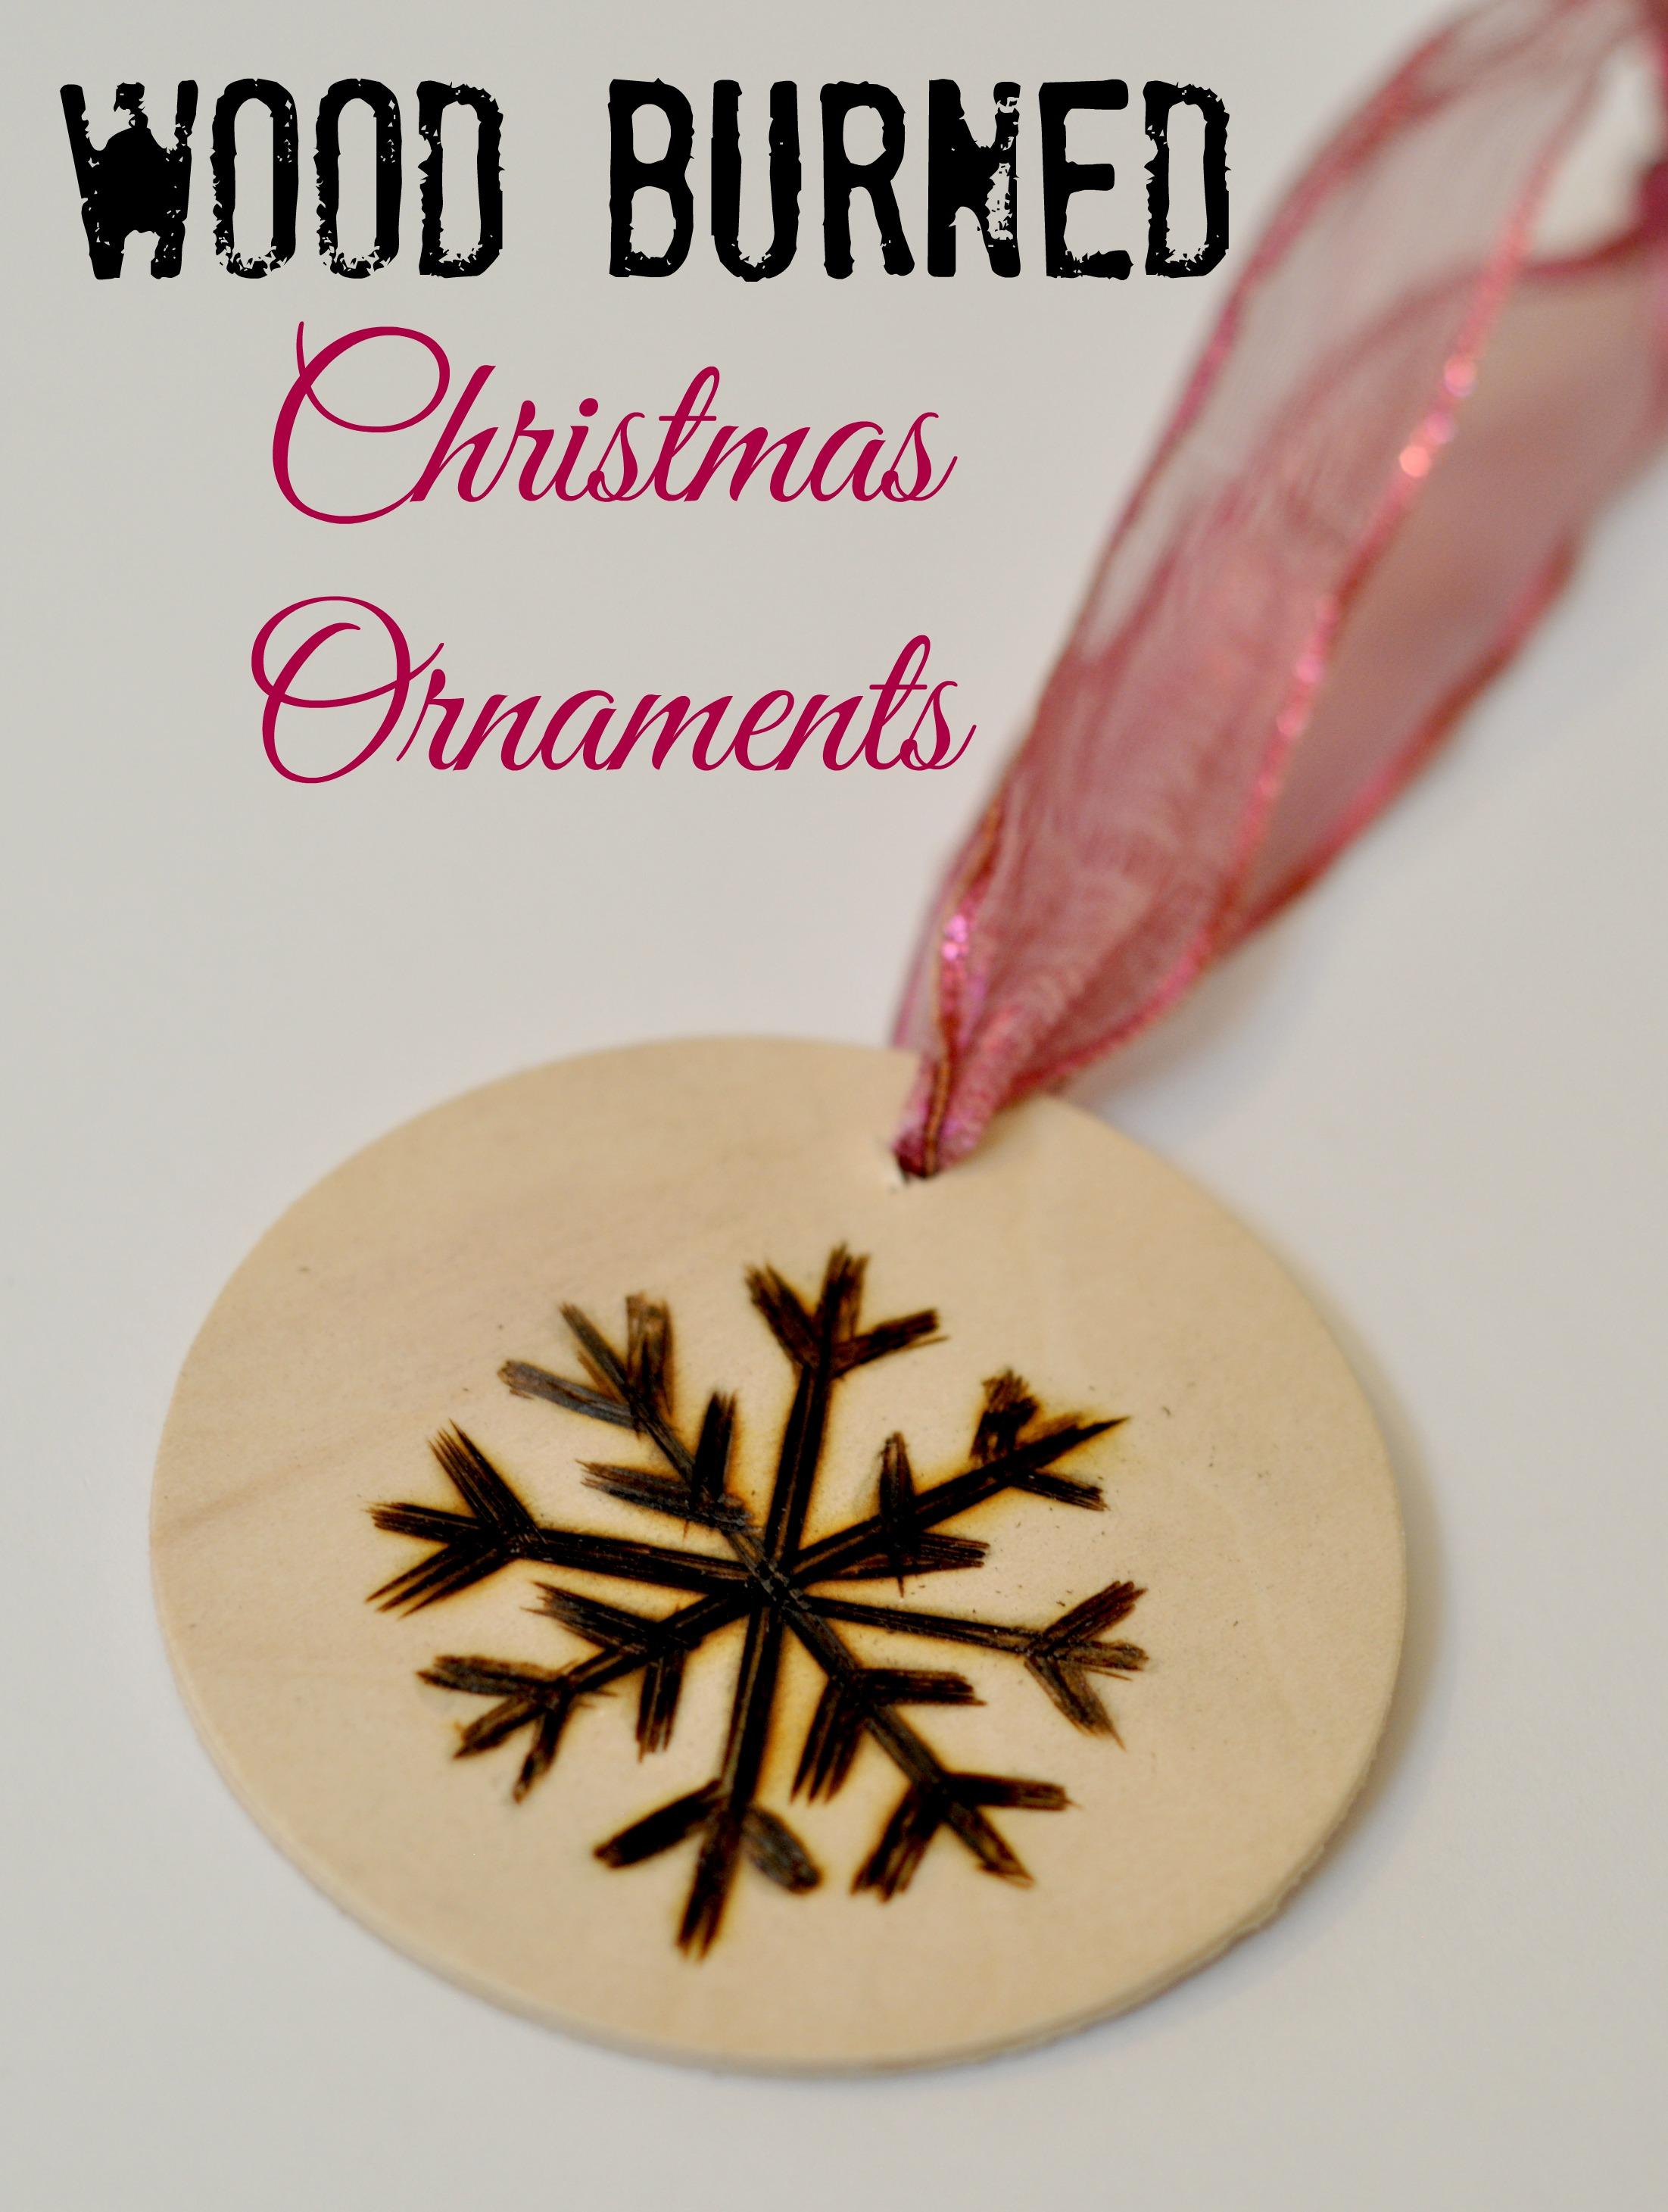 Wood burned Christmas Ornaments Suburble